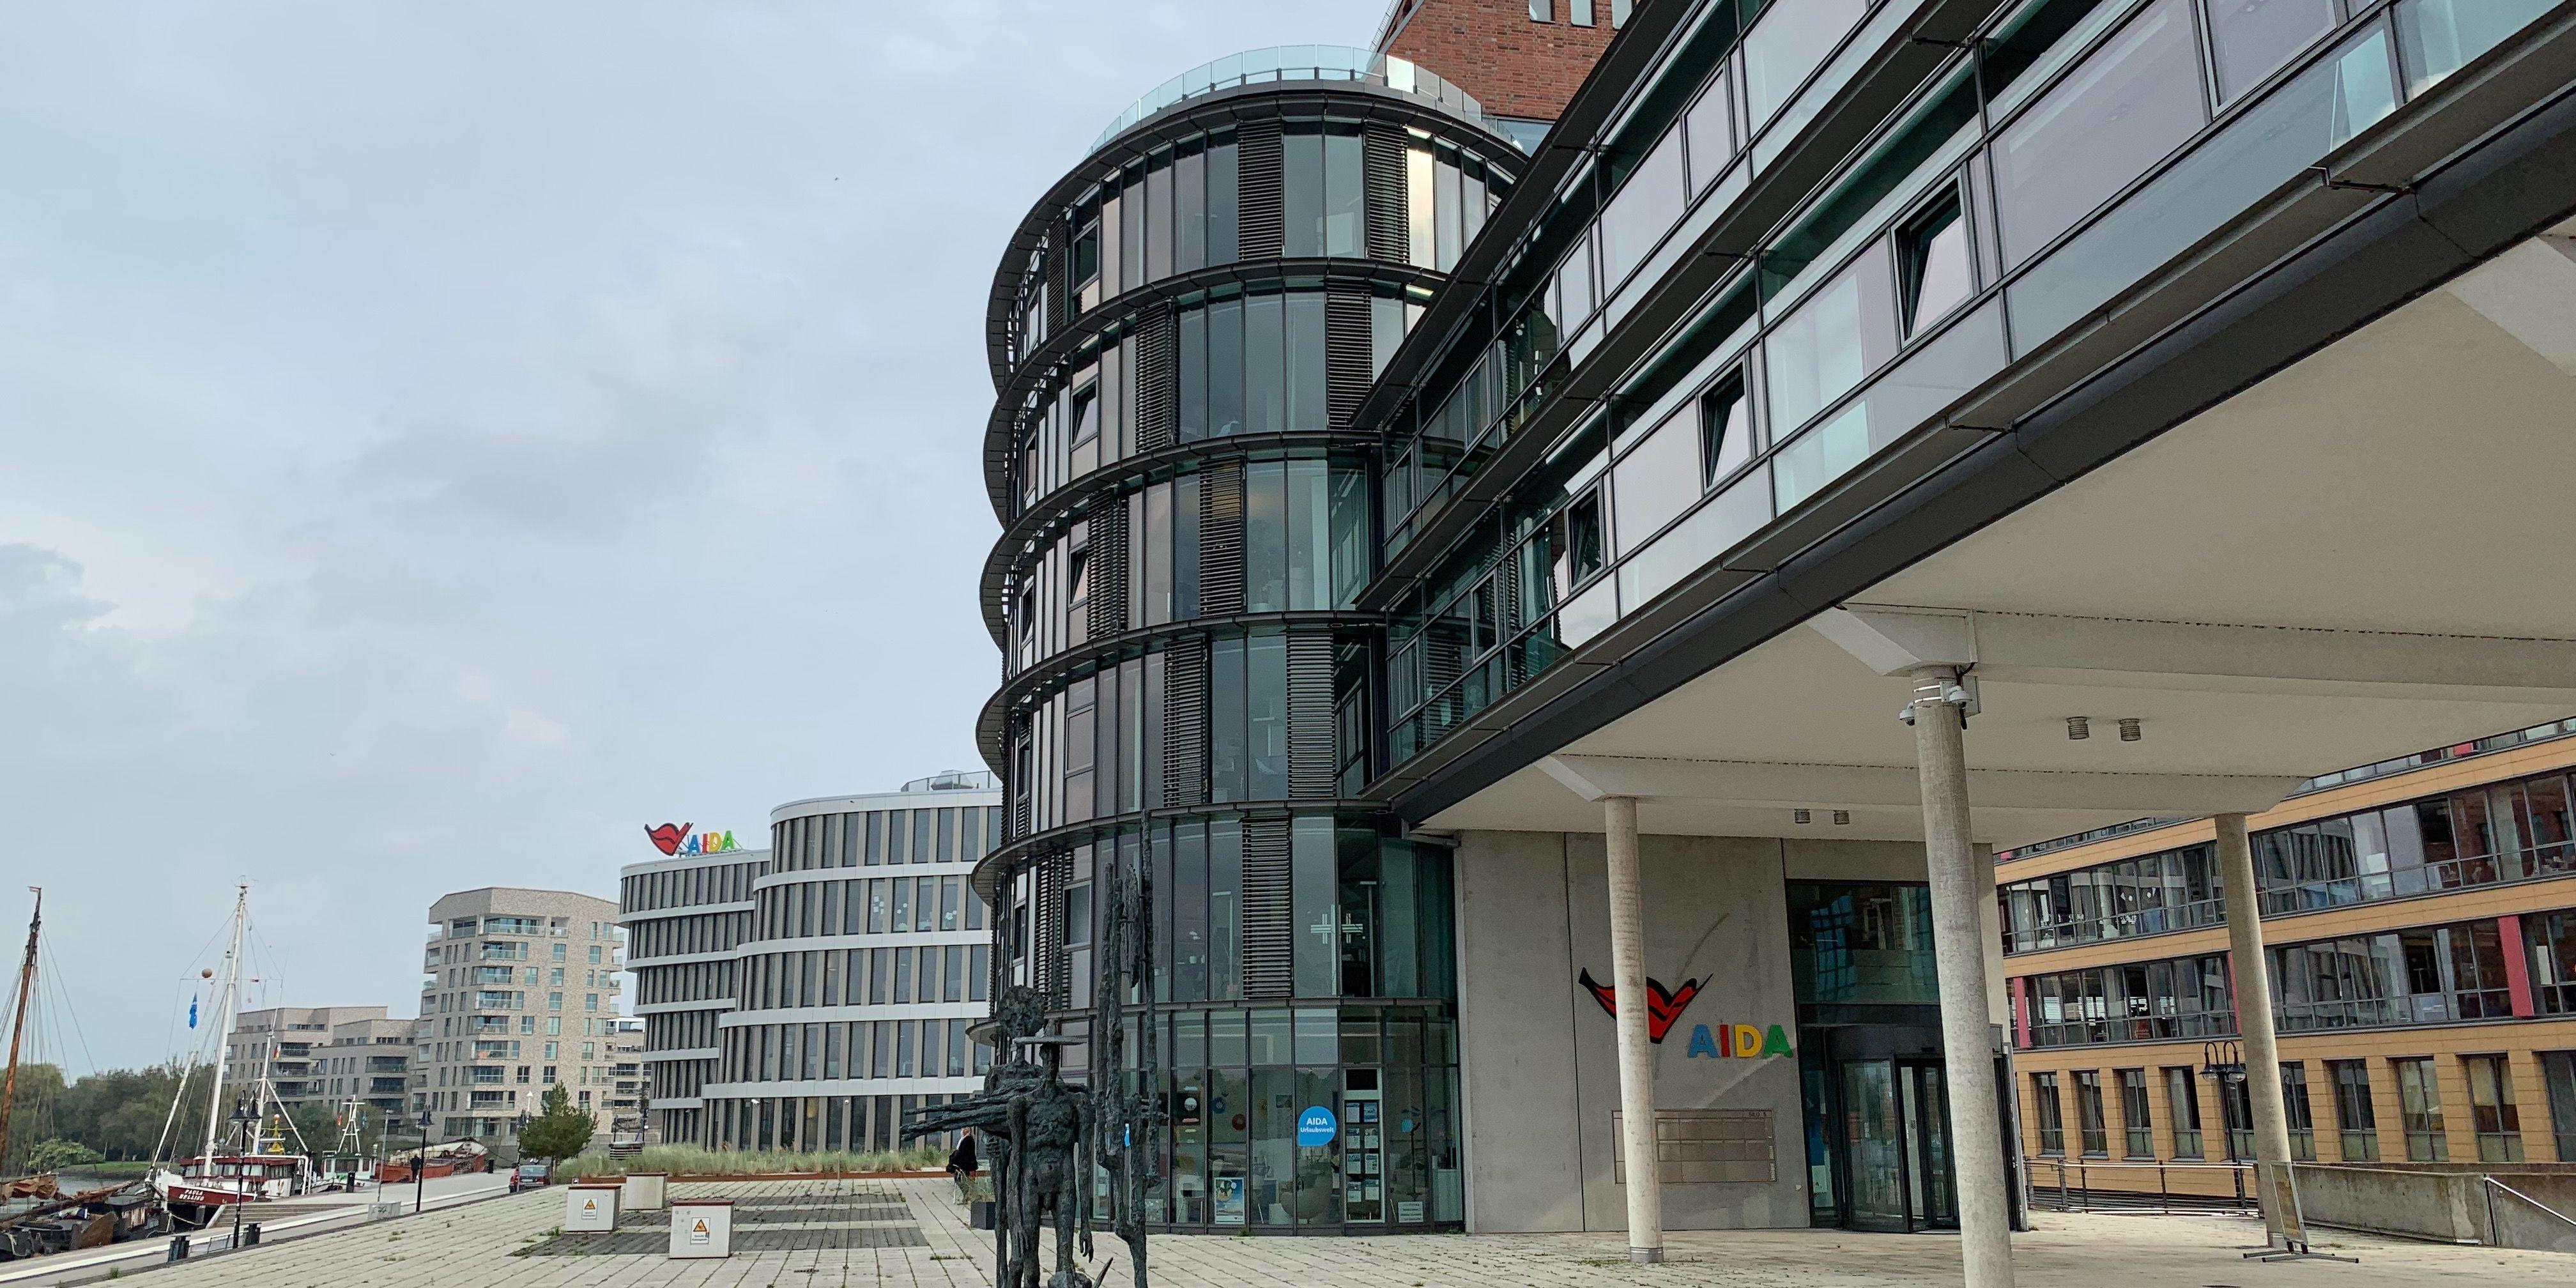 AIDA Gebäude in Rostock